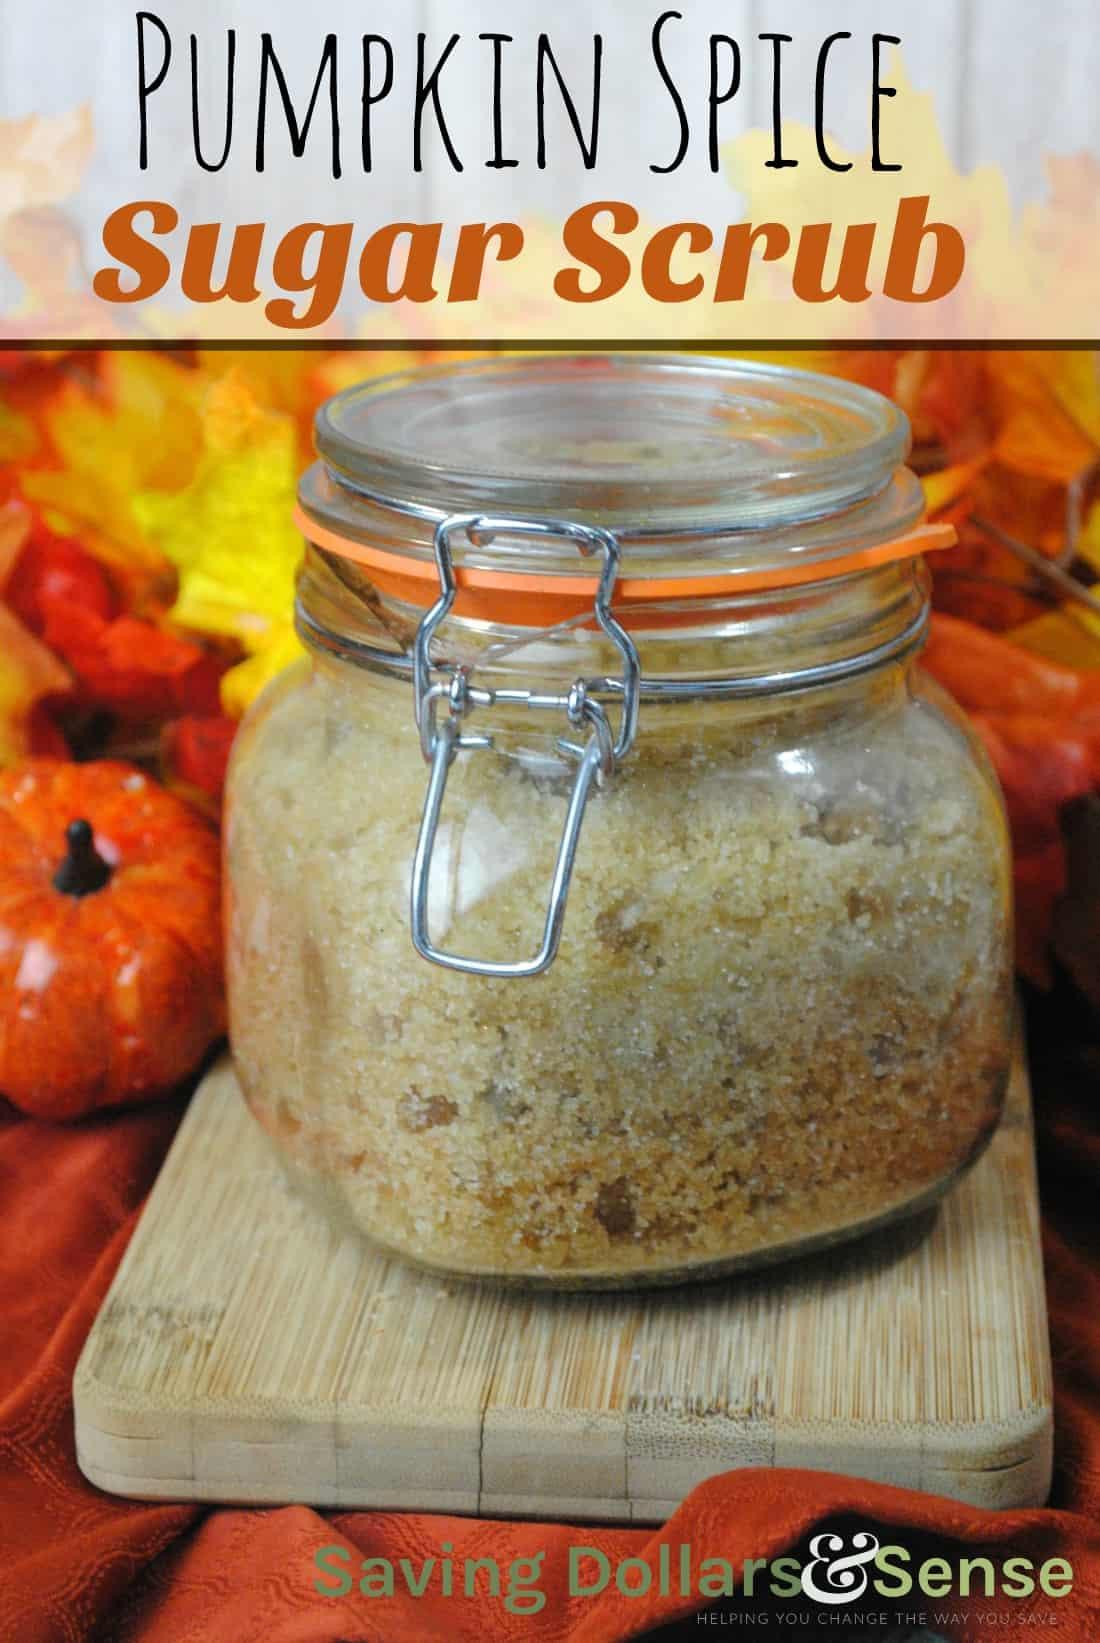 pumpkin-spice-sugar-scrub